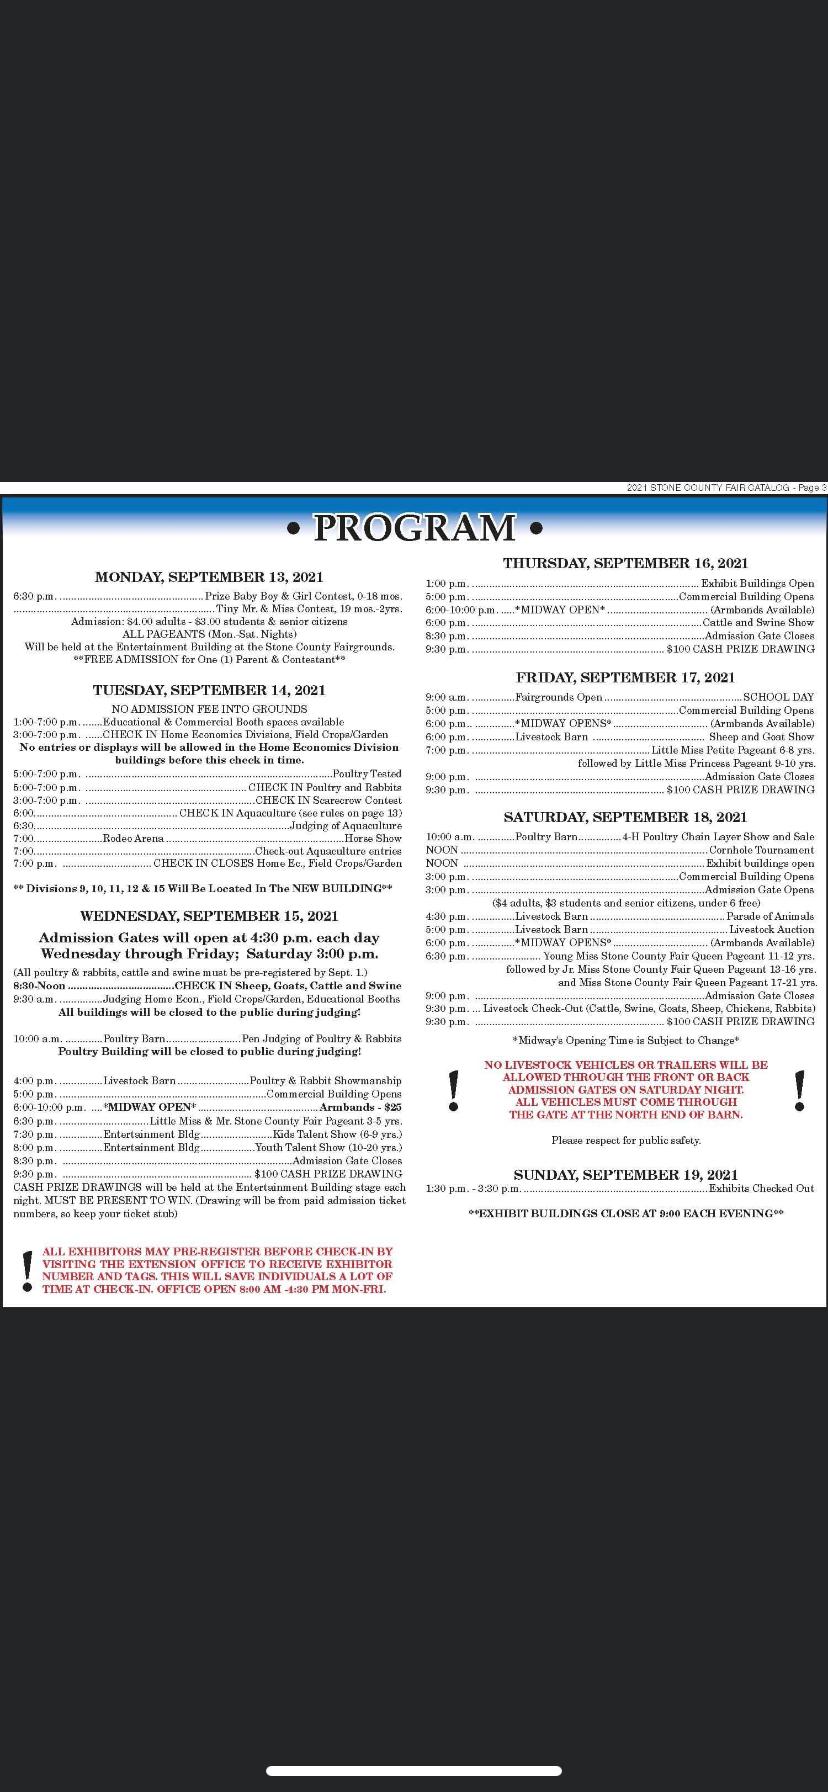 stone county fair program 2021.png